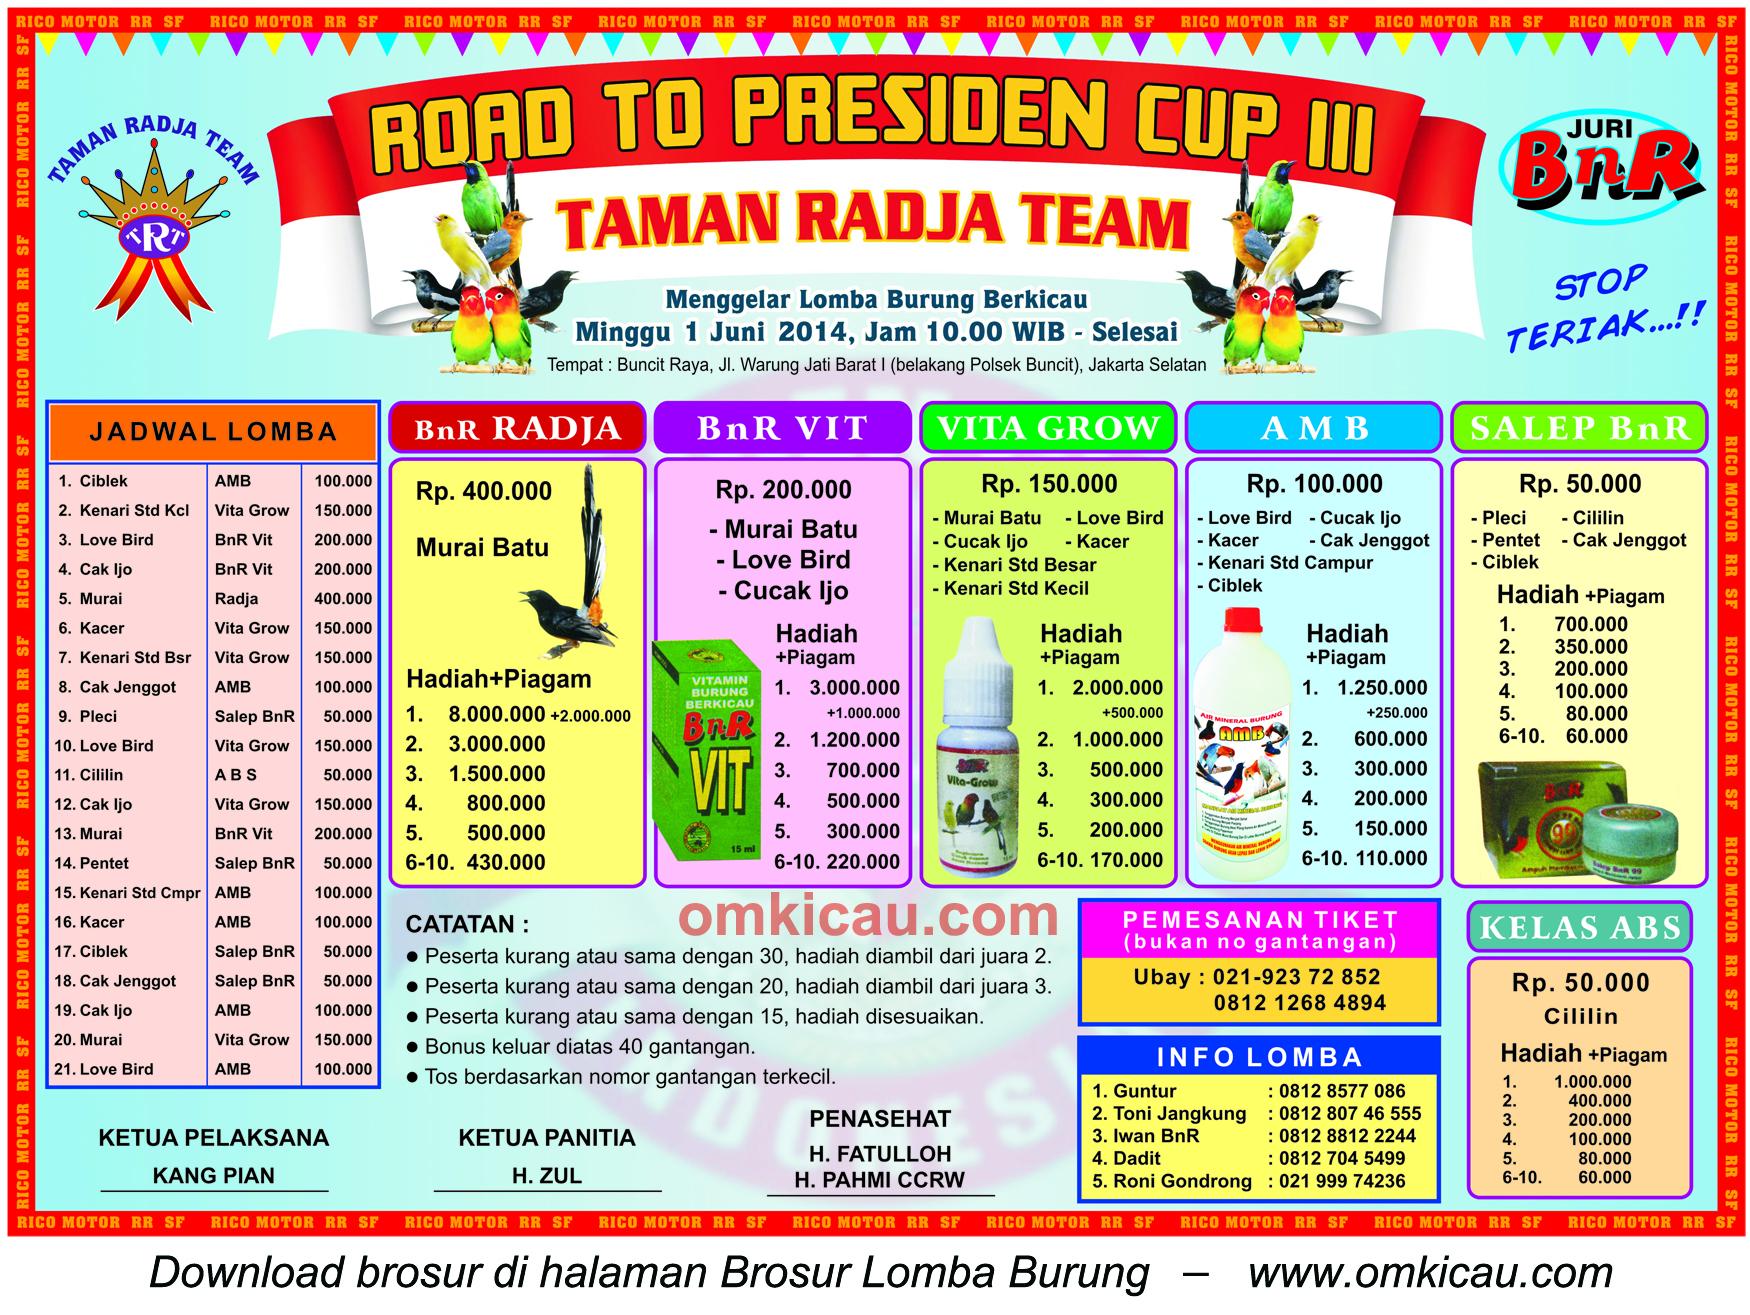 Brosur Lomba Burung Road to Presiden Cup III - Taman Radja, Jakarta Selatan, 1 Juni 2014